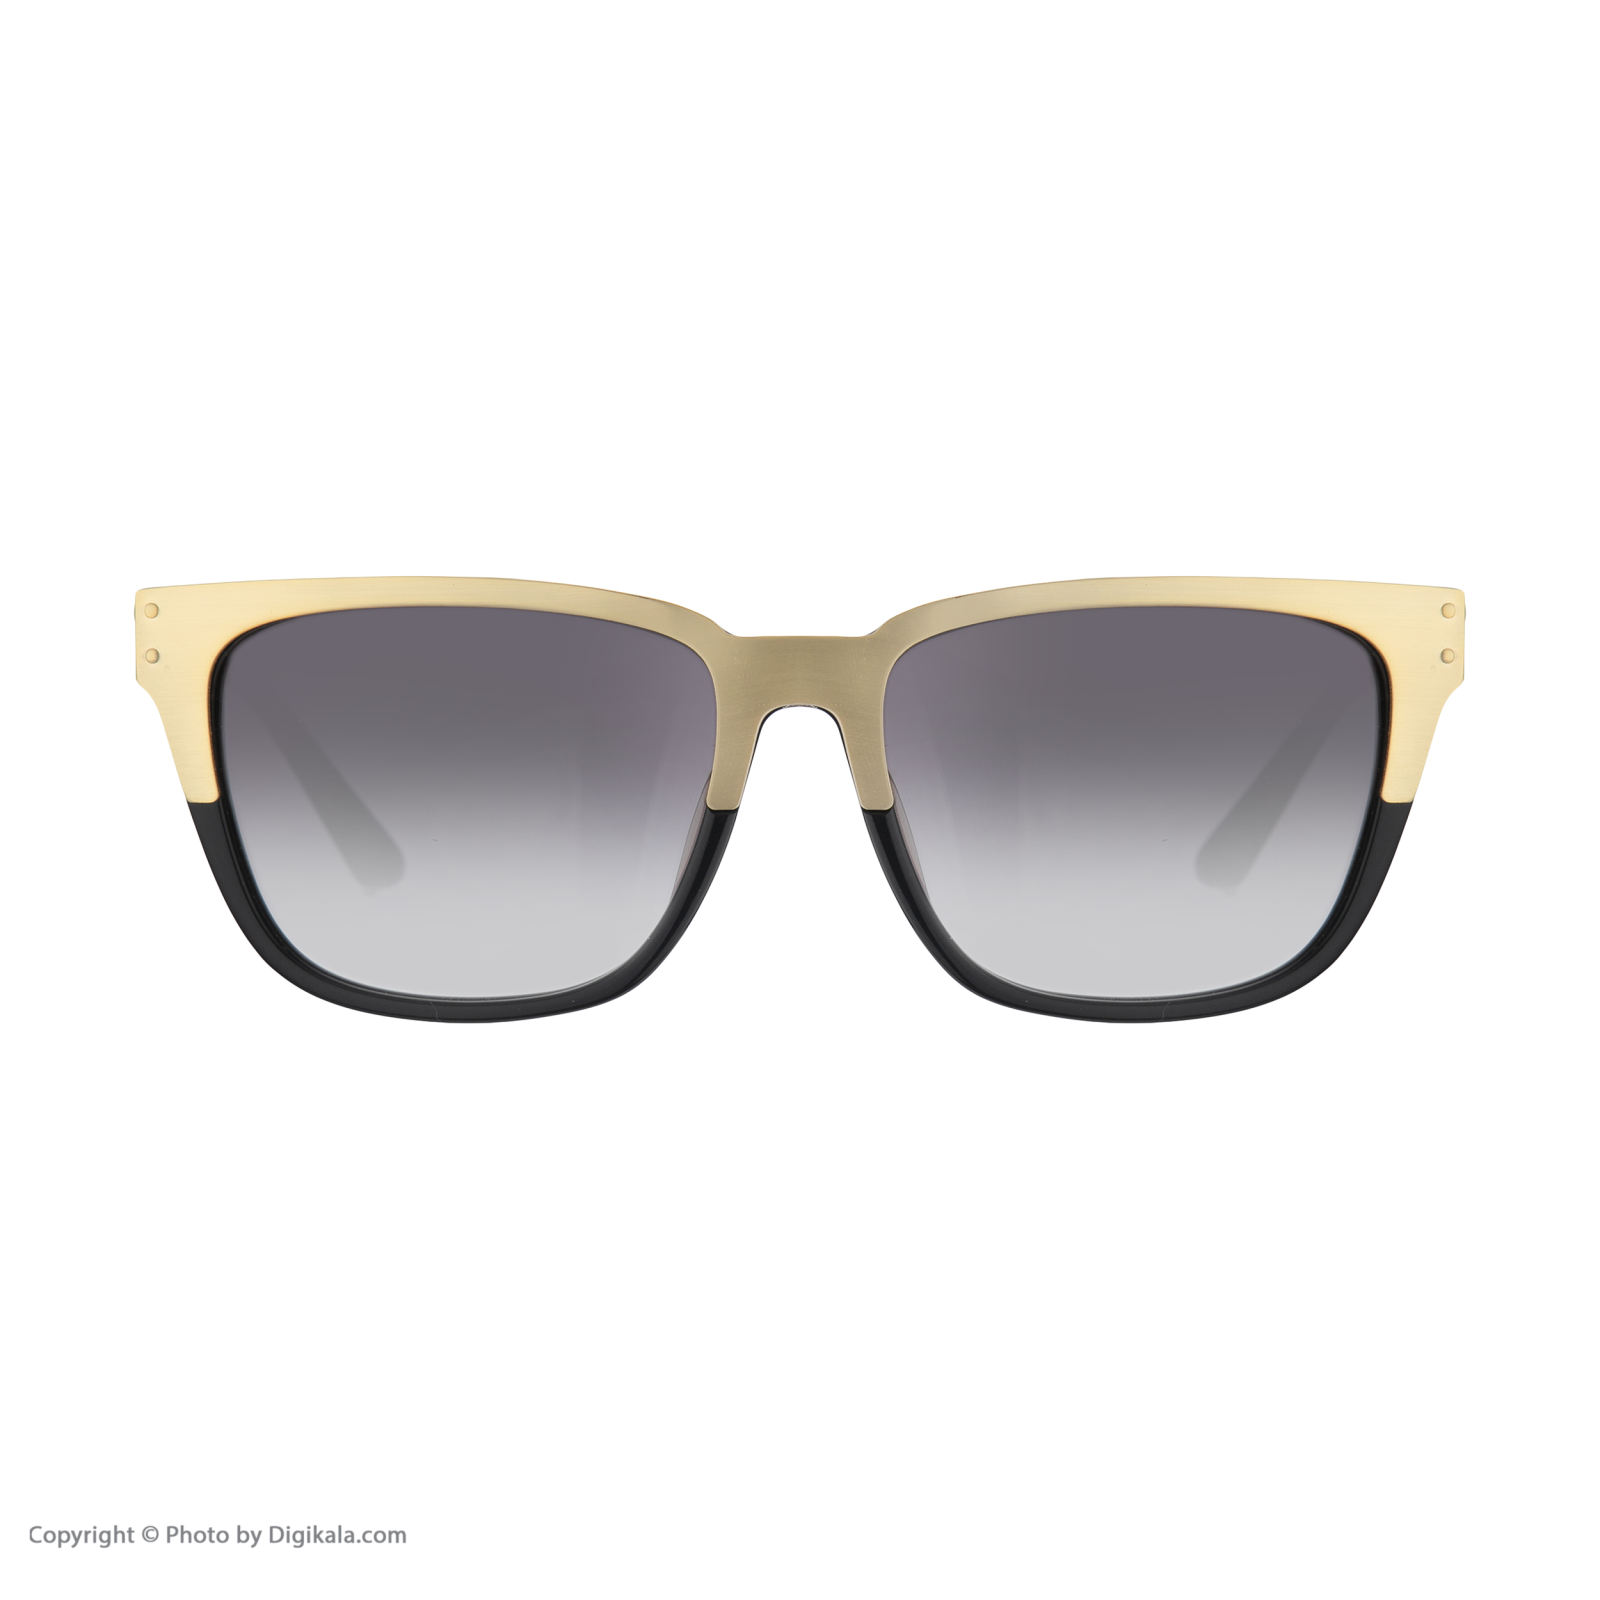 عینک آفتابی کلویی مدل 2149 -  - 3